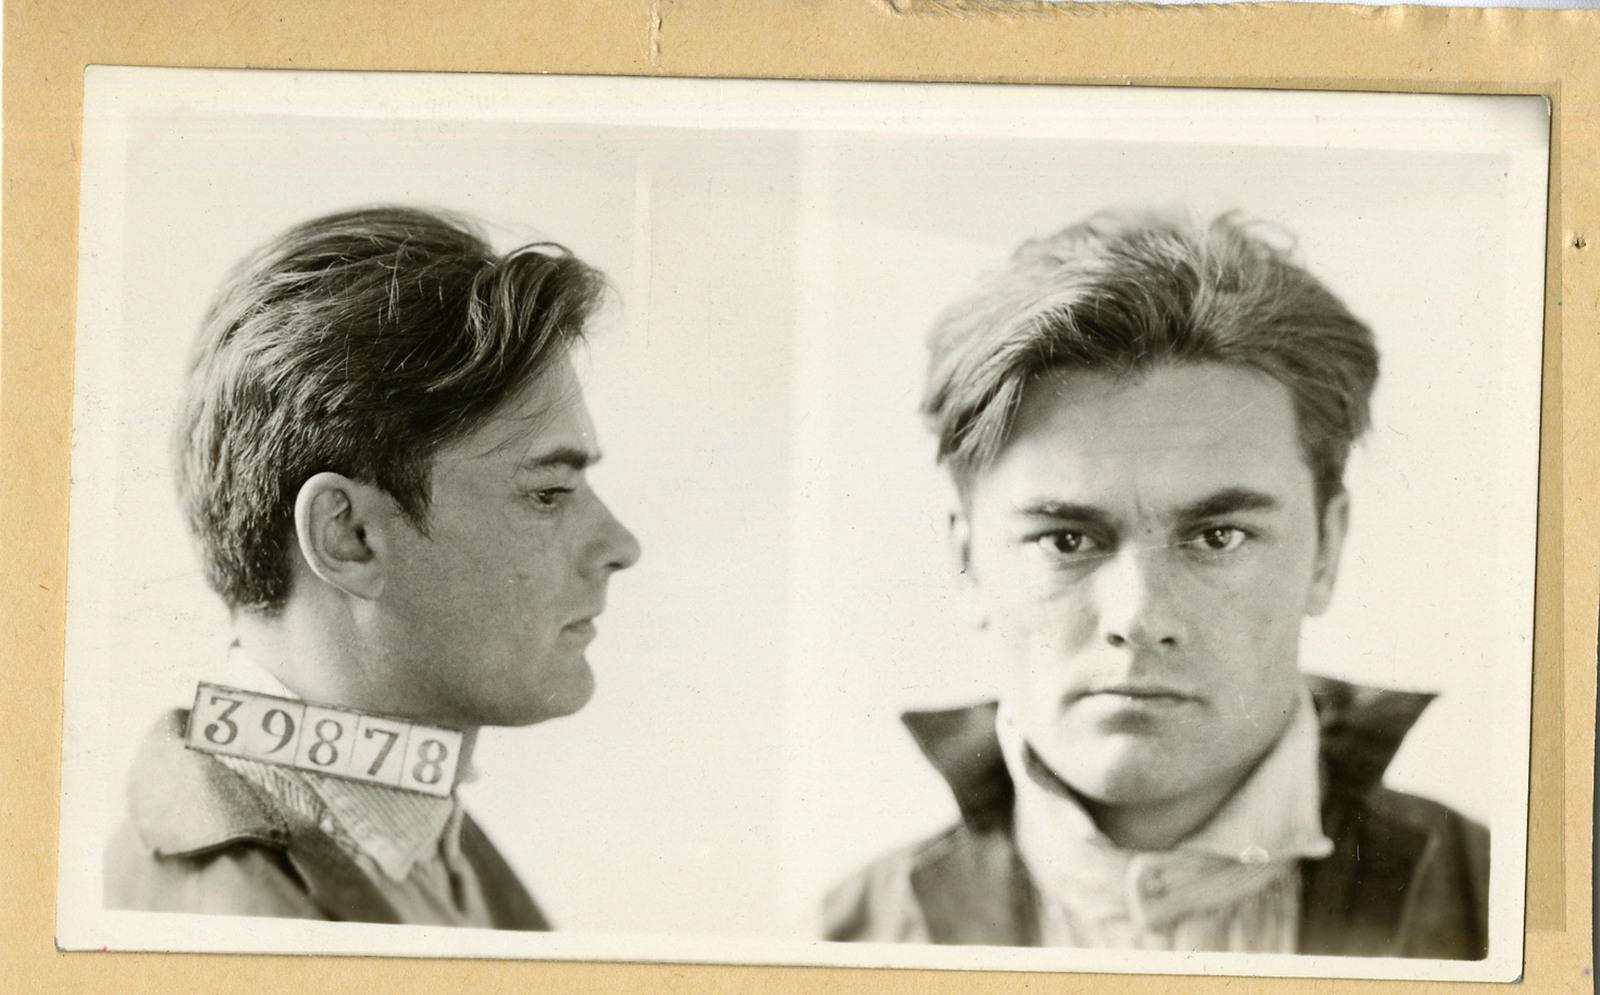 Photograph of Joseph Tymchuk